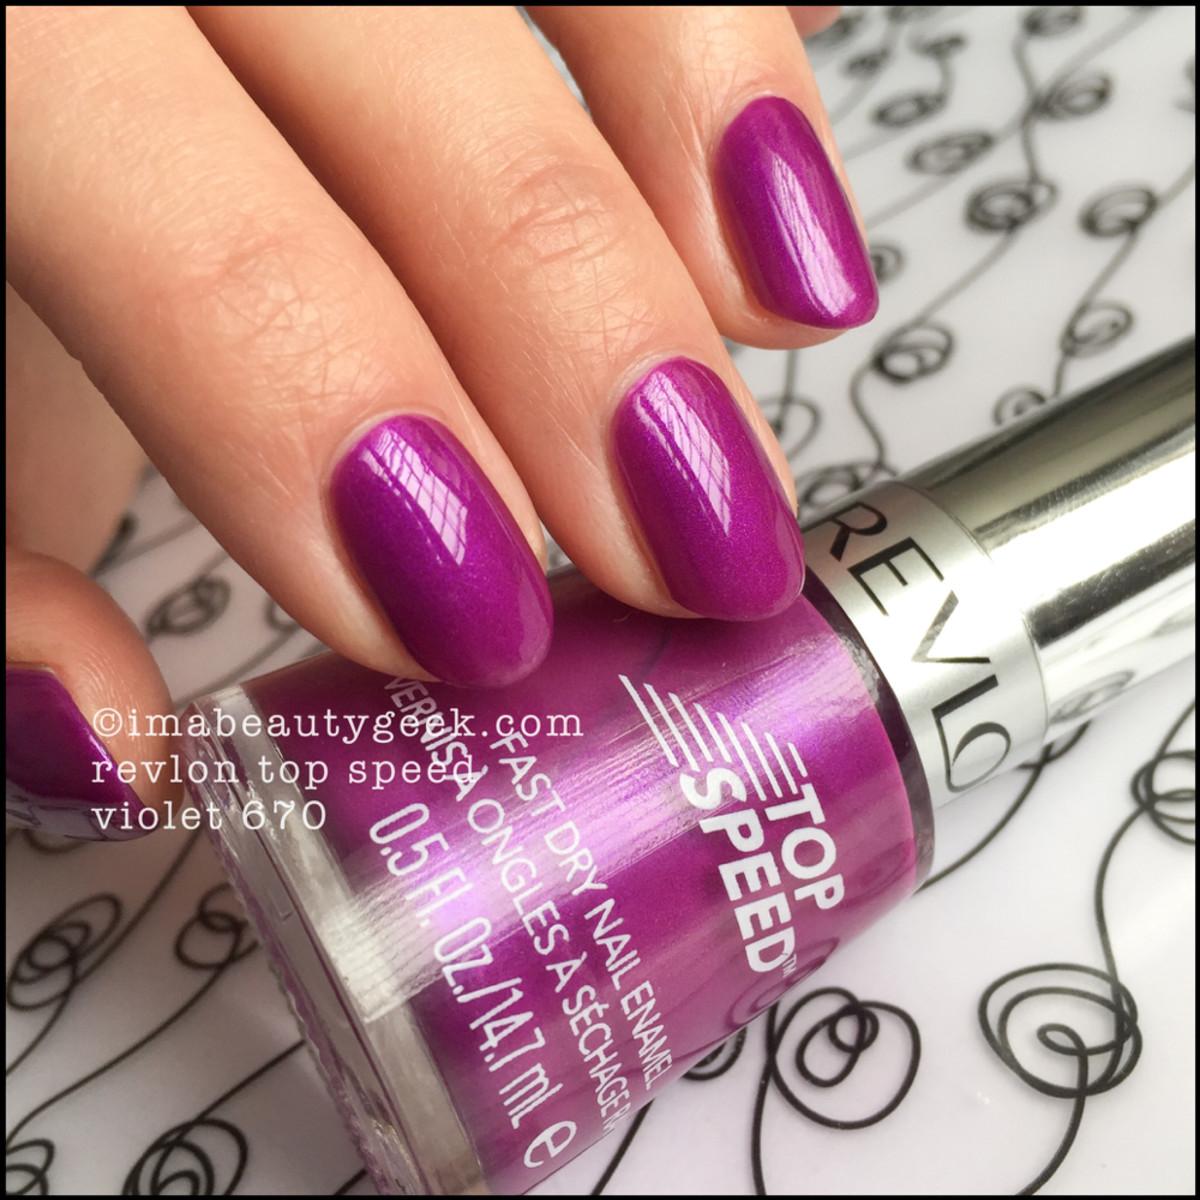 Revlon Violet Nail Polish 670_Revlon Top Speed Nail Enamel